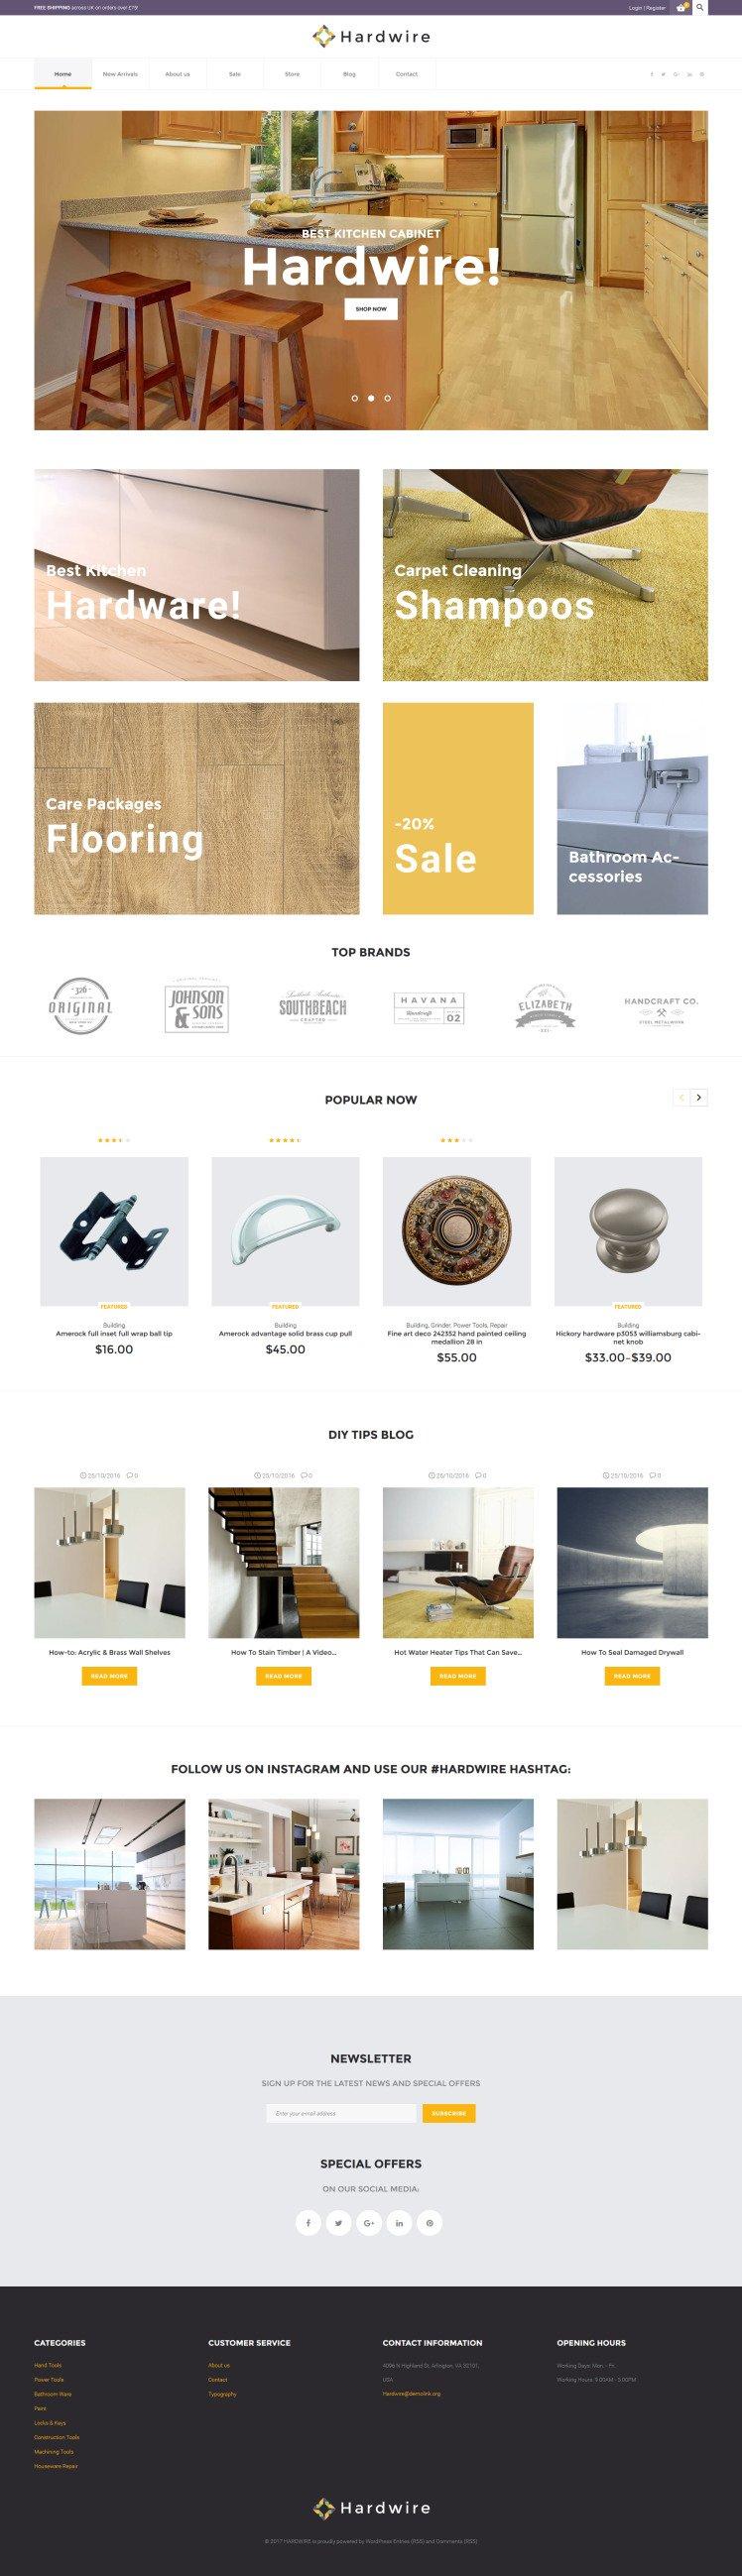 Hardwire Household Hardware Store Responsive WooCommerce Theme